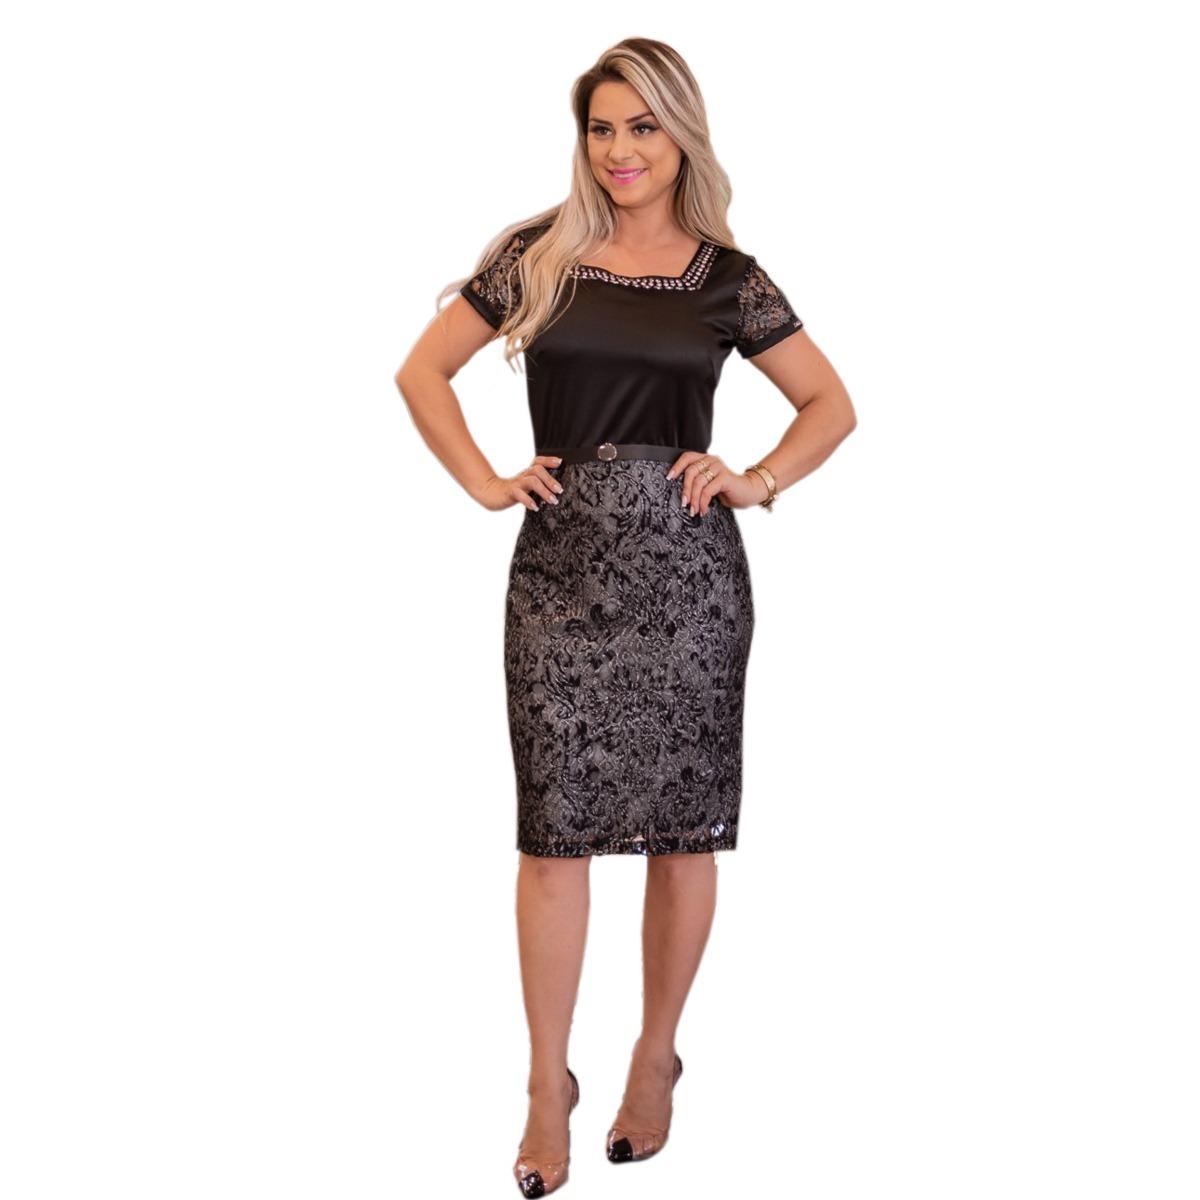 eb36f95a2 vestido feminino midi renda social festa moda evangélica. Carregando zoom.